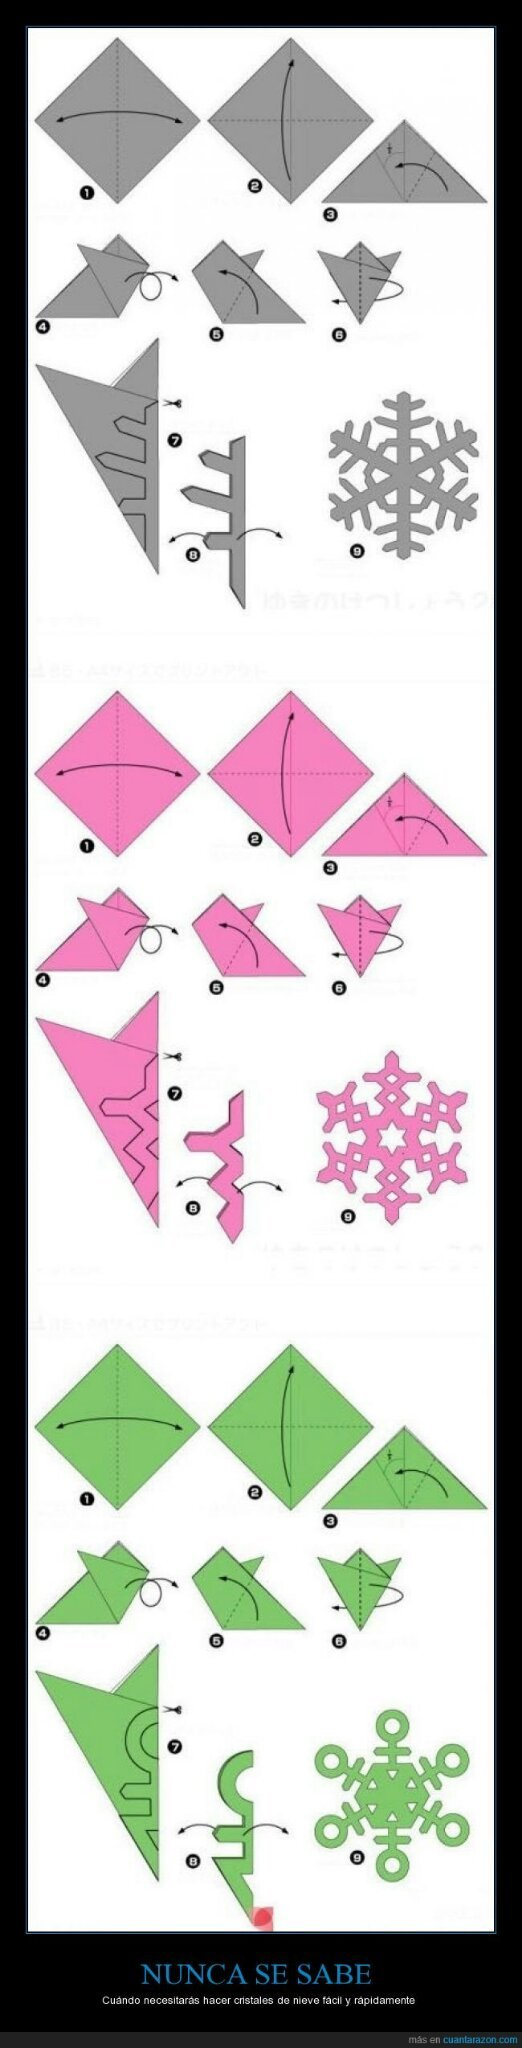 Como hacer copos de nieve - meme